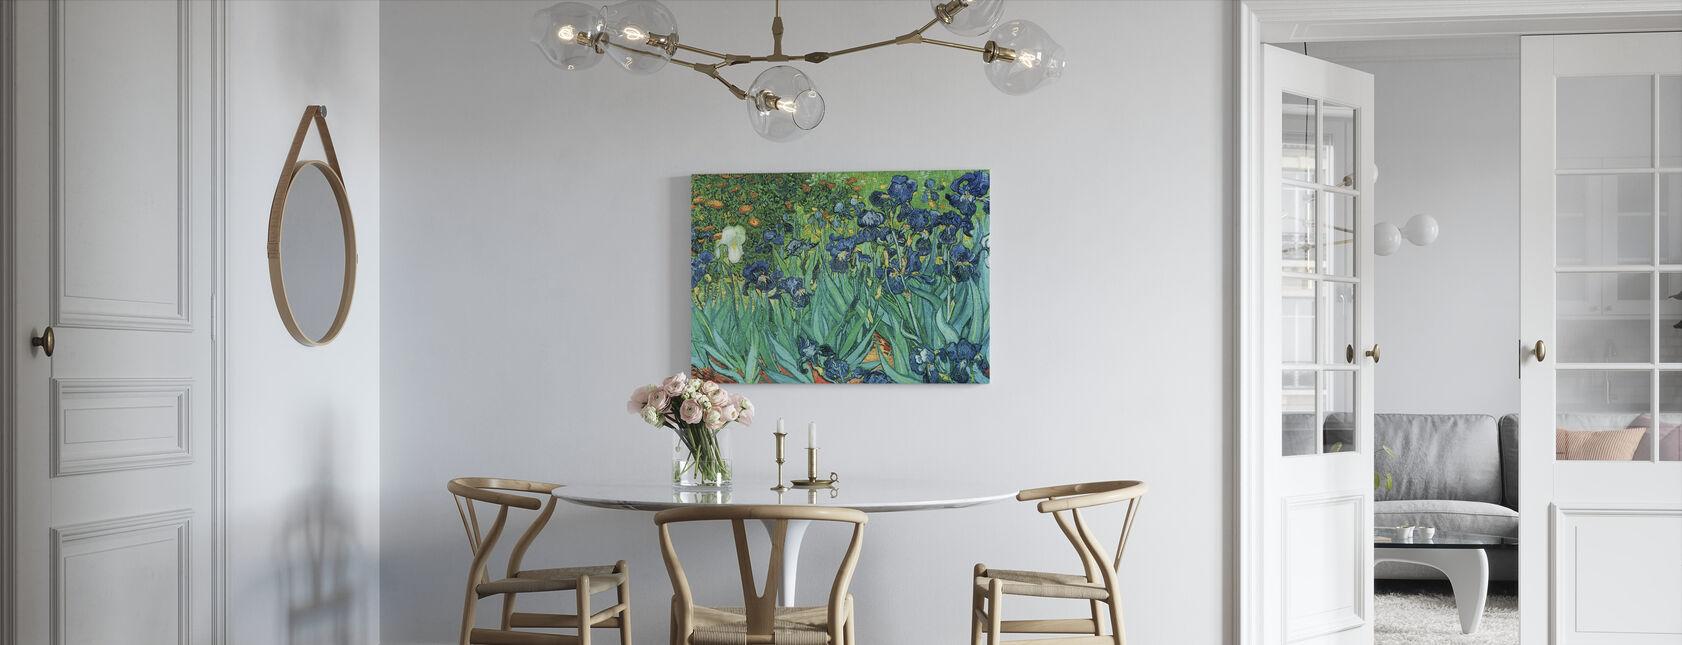 Irises, Vincent van Gogh - Canvas print - Kitchen